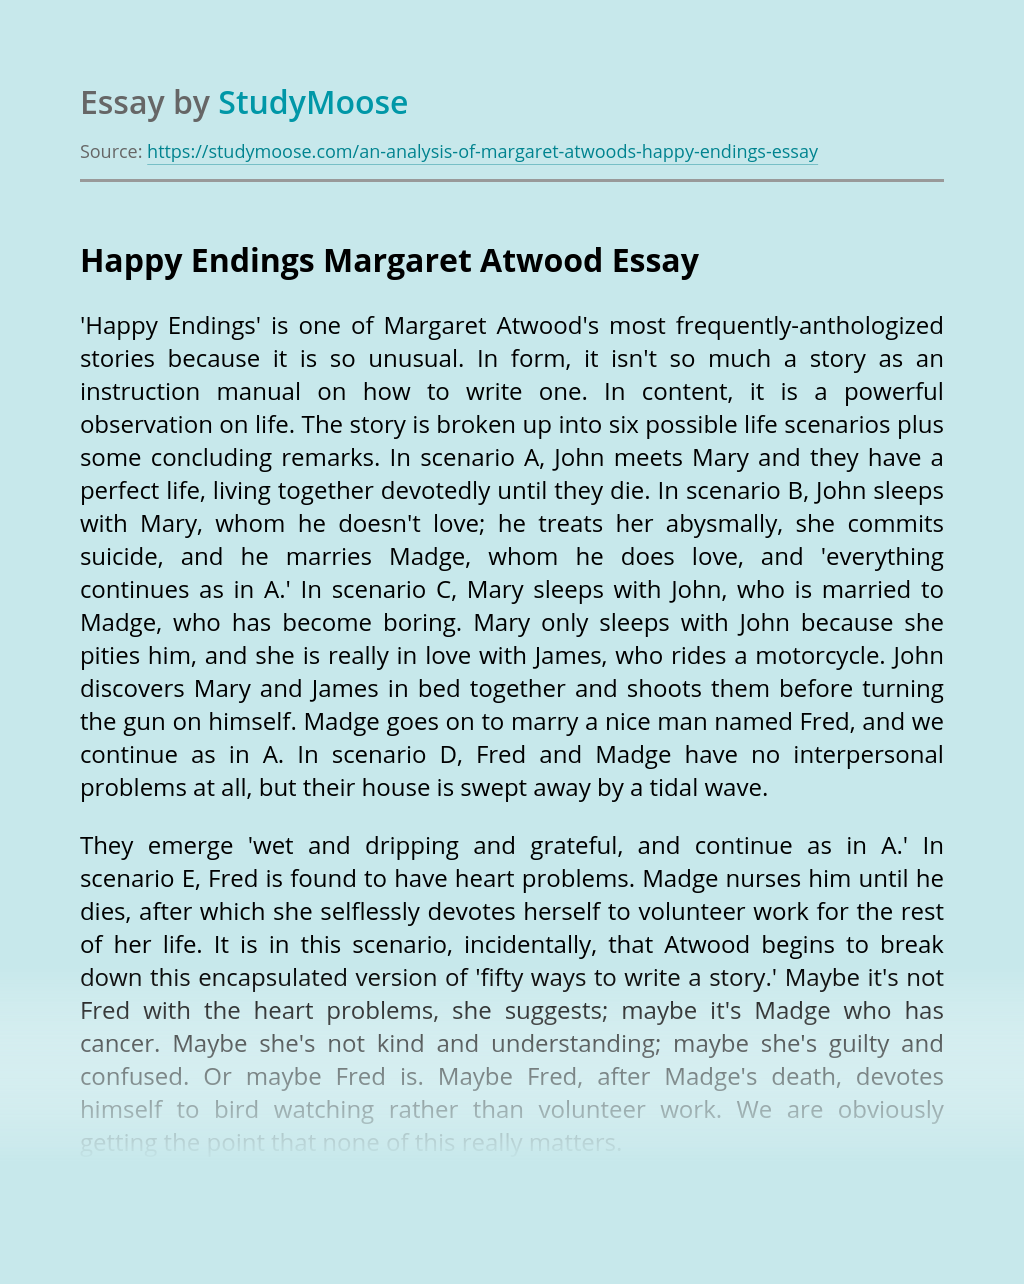 Happy Endings Margaret Atwood